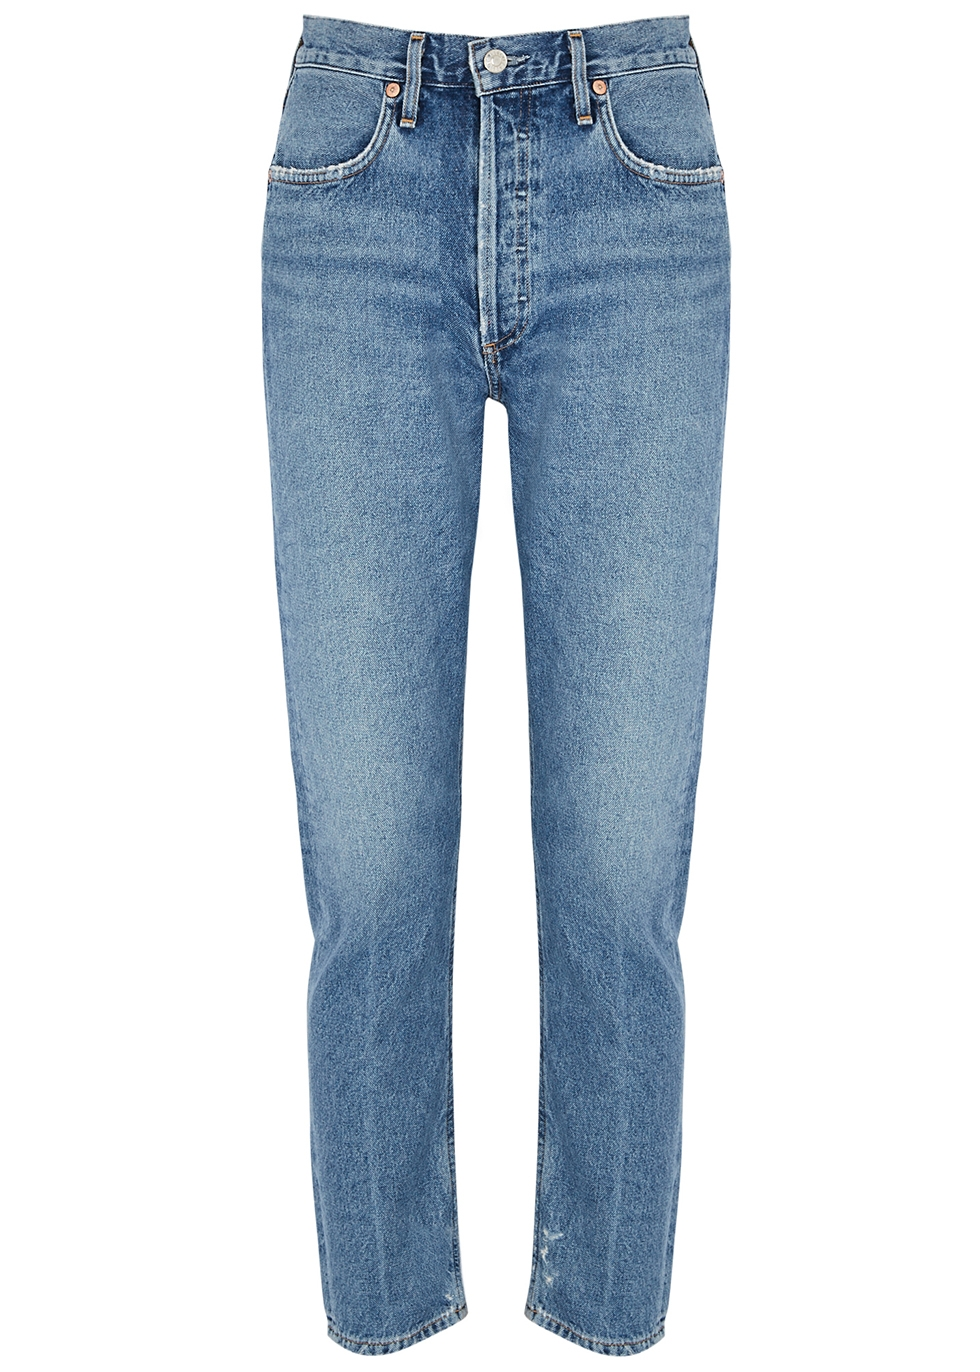 Jamie blue straight-leg jeans